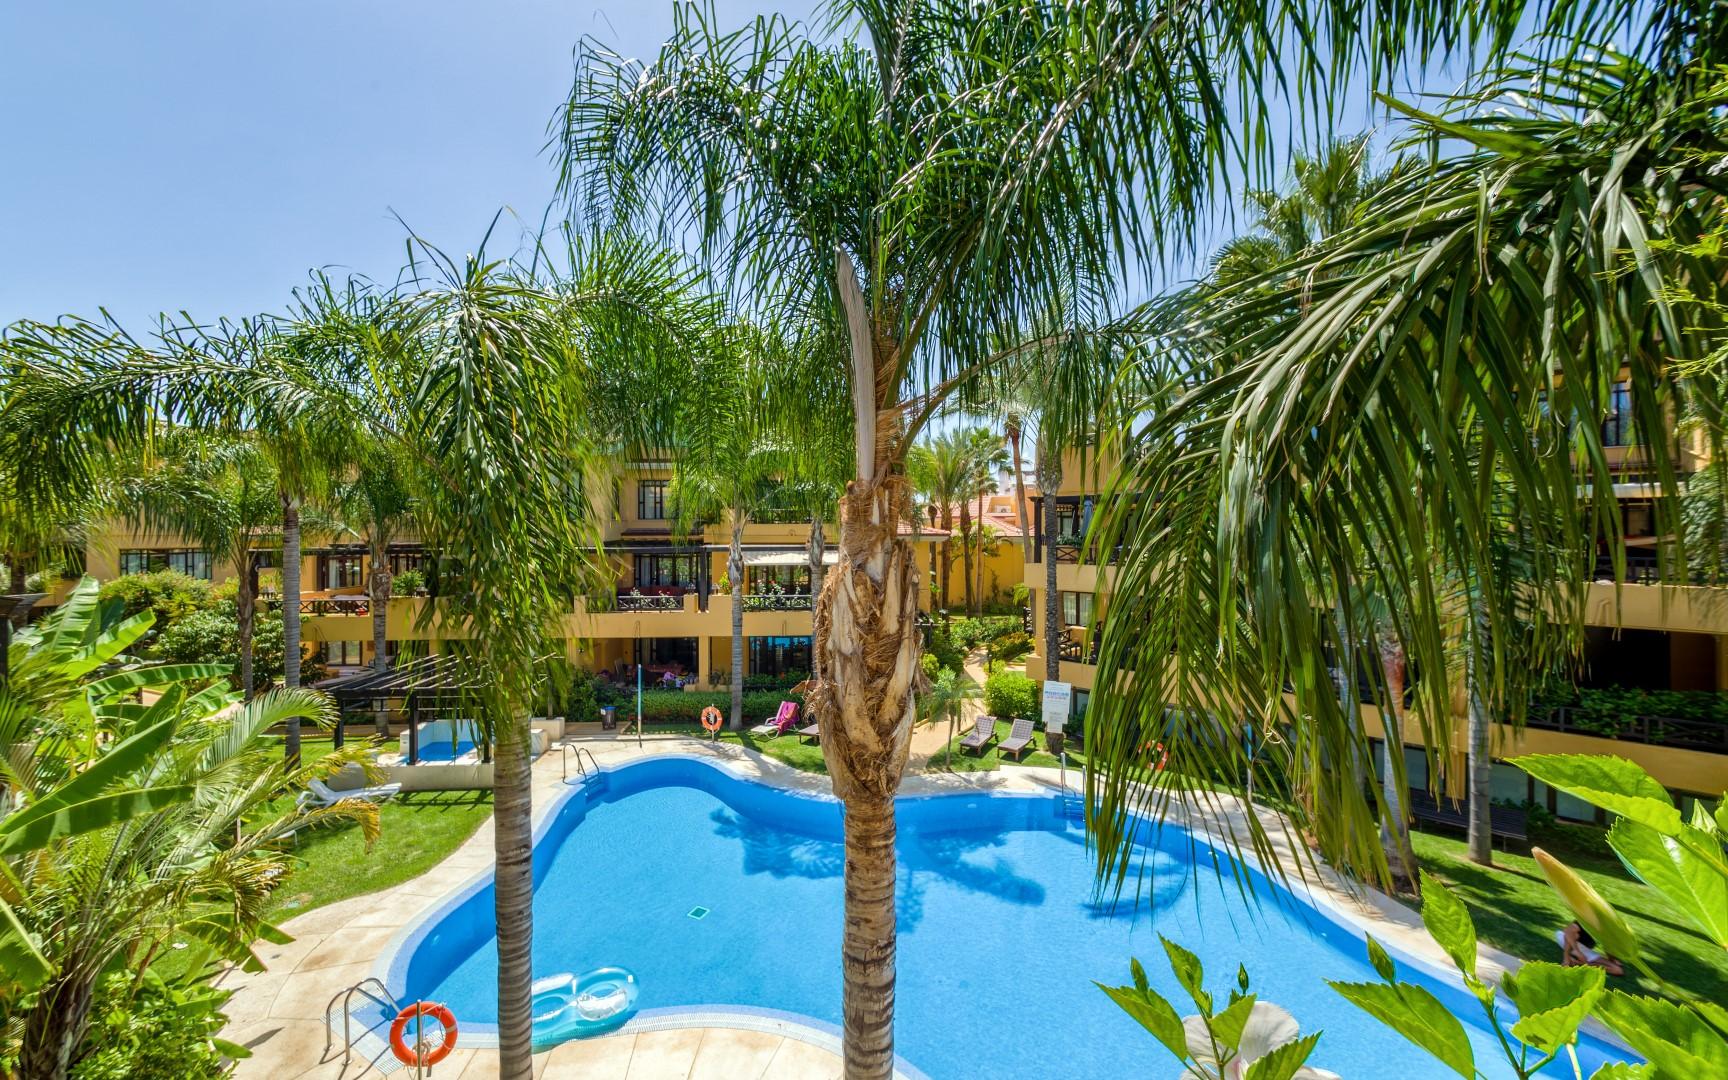 The attractive Golden Visa brings property investors to Marbella